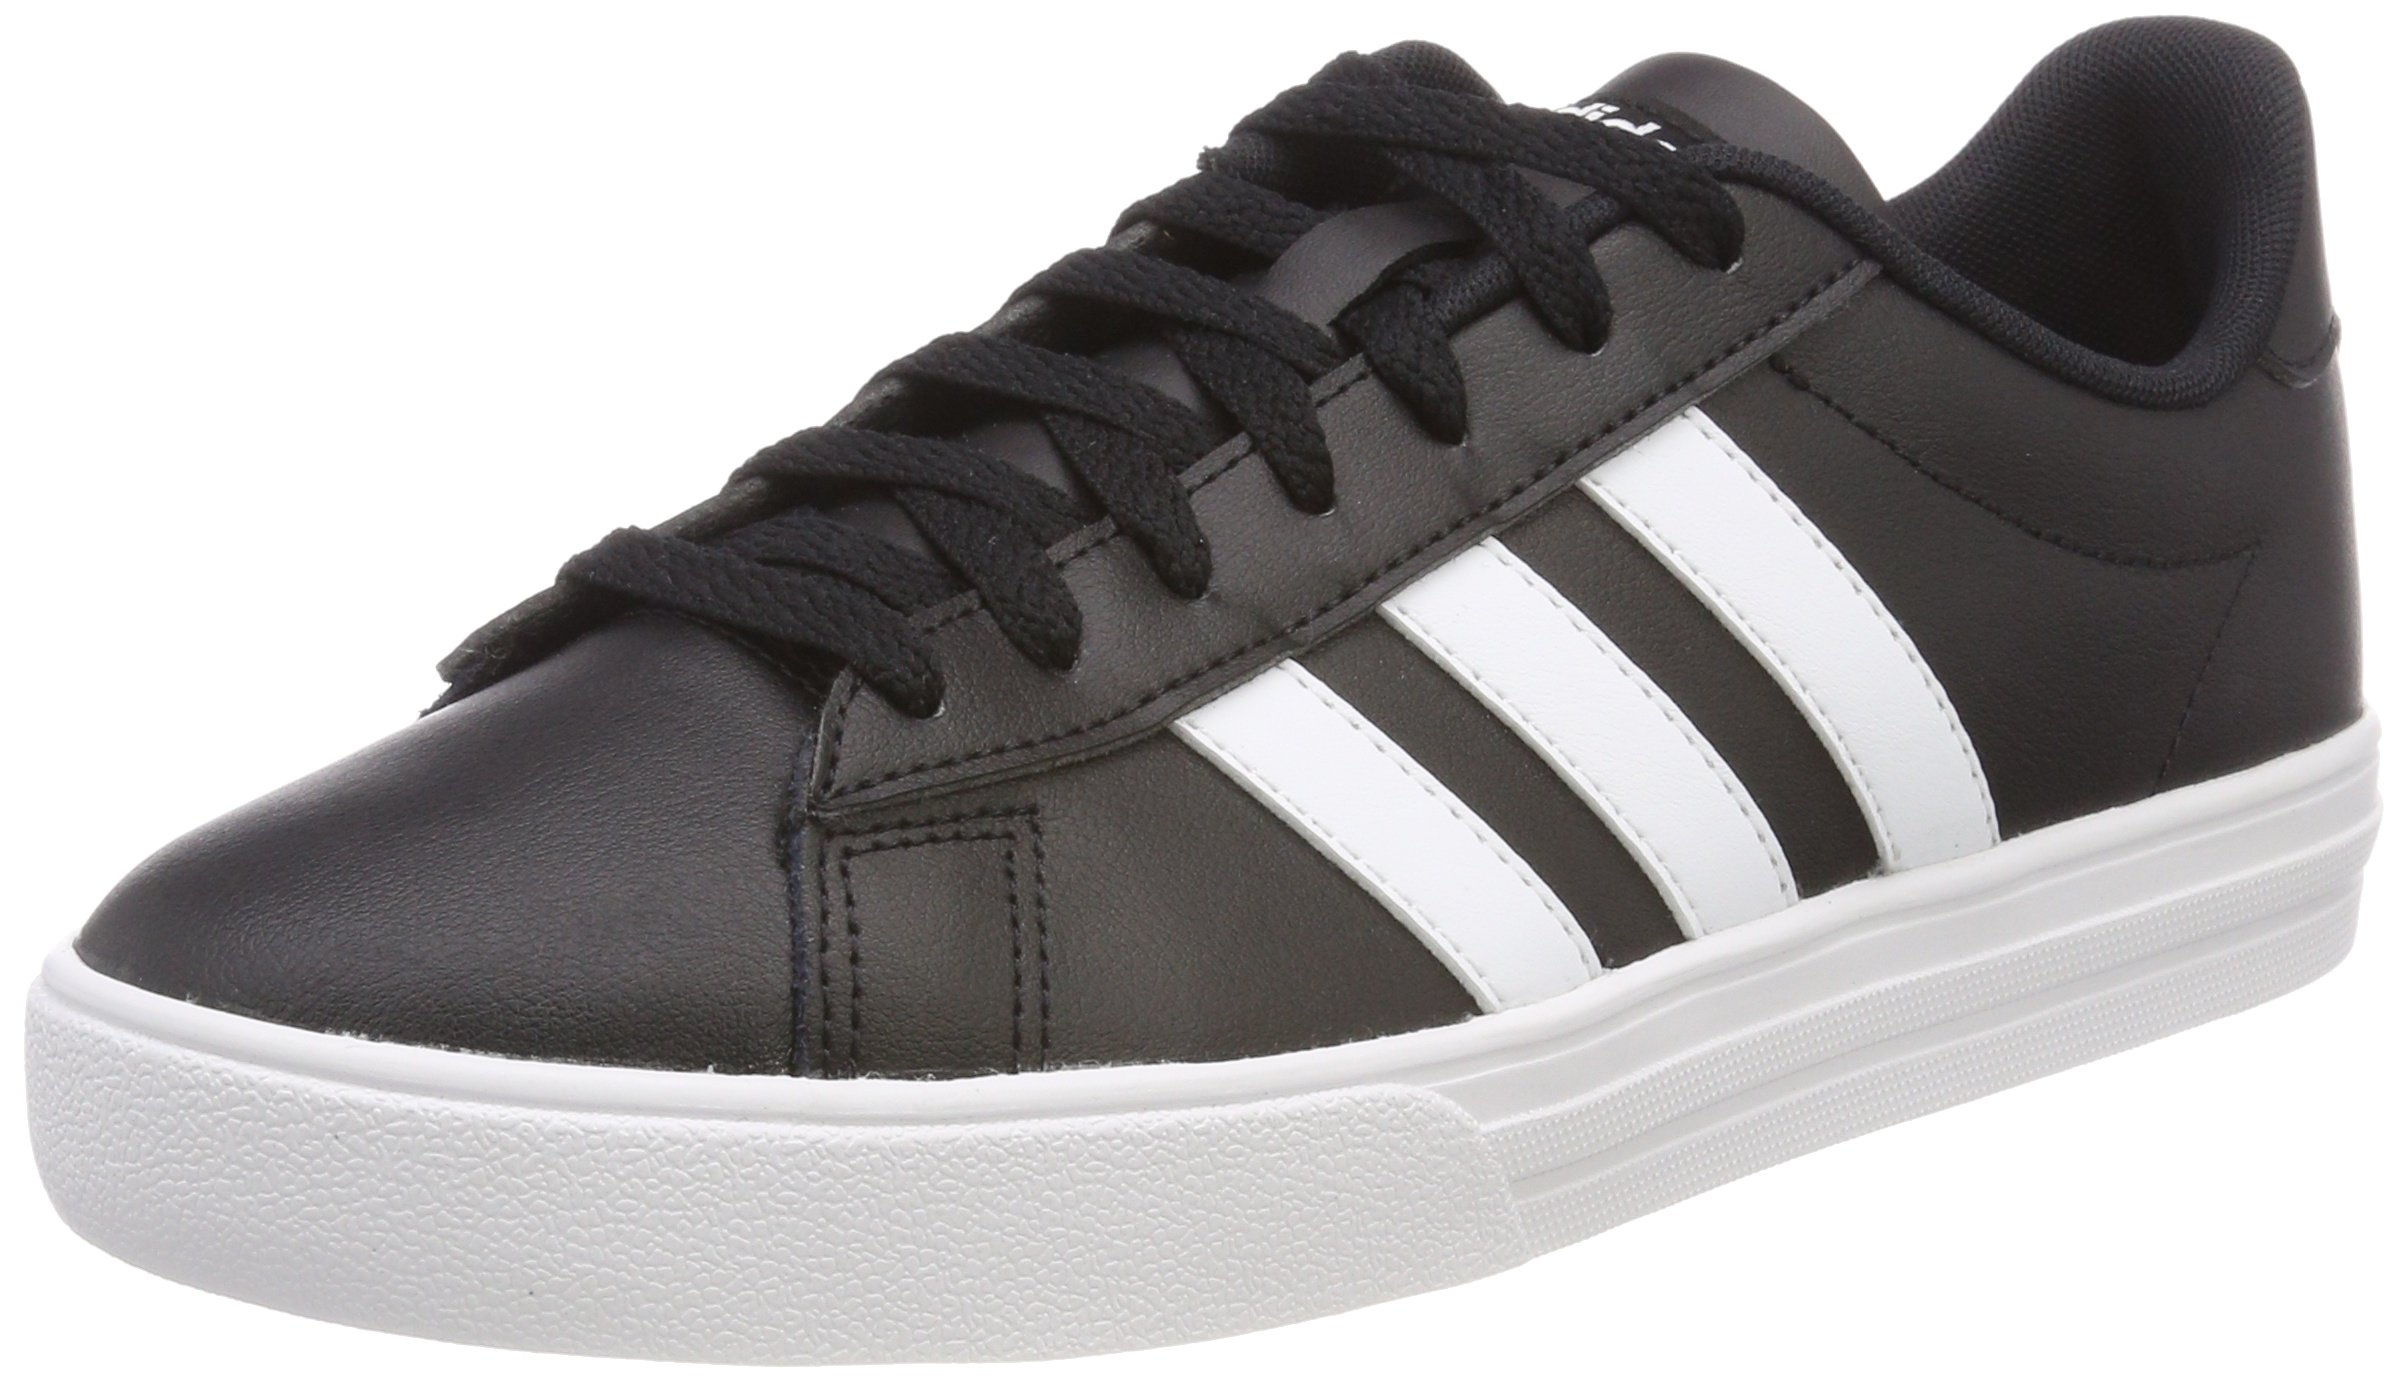 2 0 Daily 1 HommeNoirblack45 Eu Basses Db0161Sneakers 3 Adidas f76Ybvgy